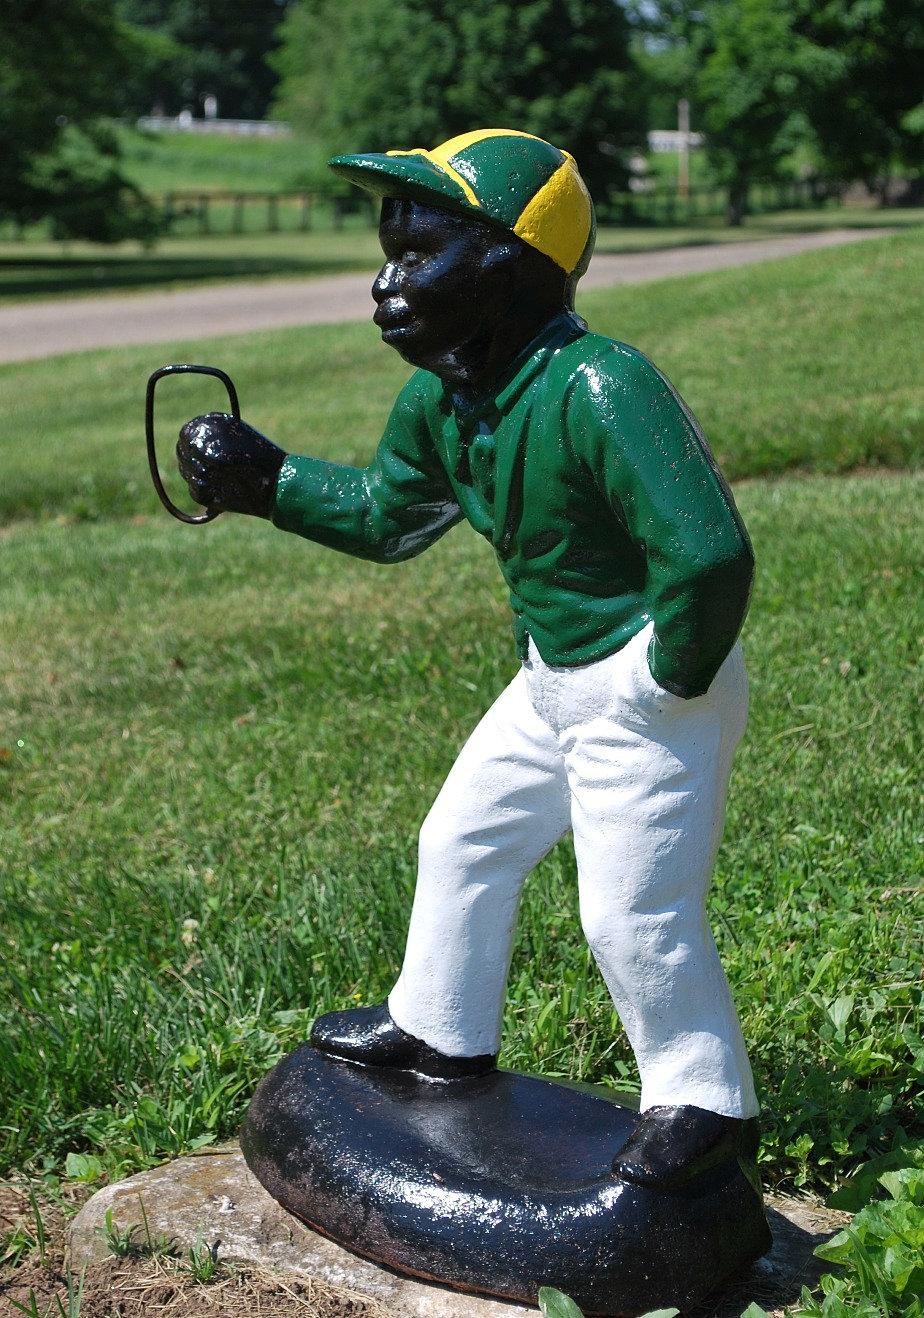 Kentucky Lawn Jockey Kuster Jocko Graves